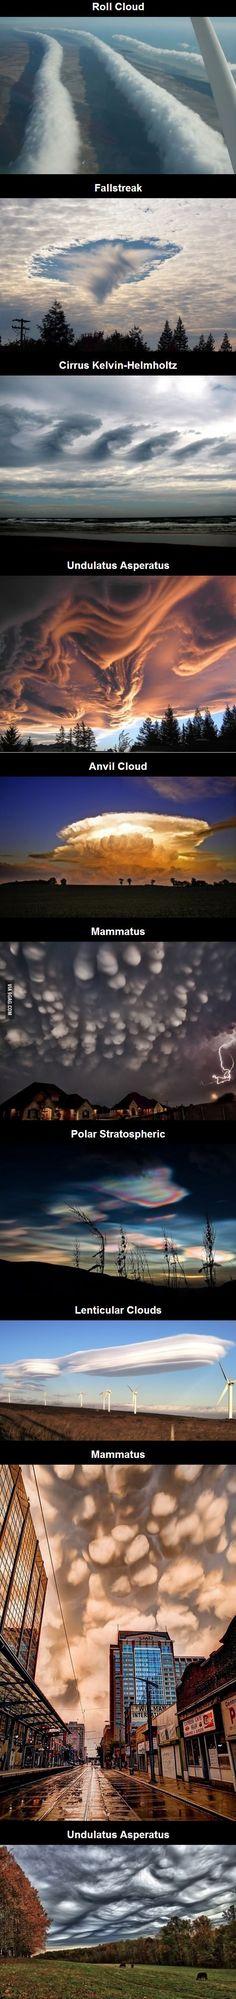 Damn Nature, You Scary, yet b-e-a-utiful!